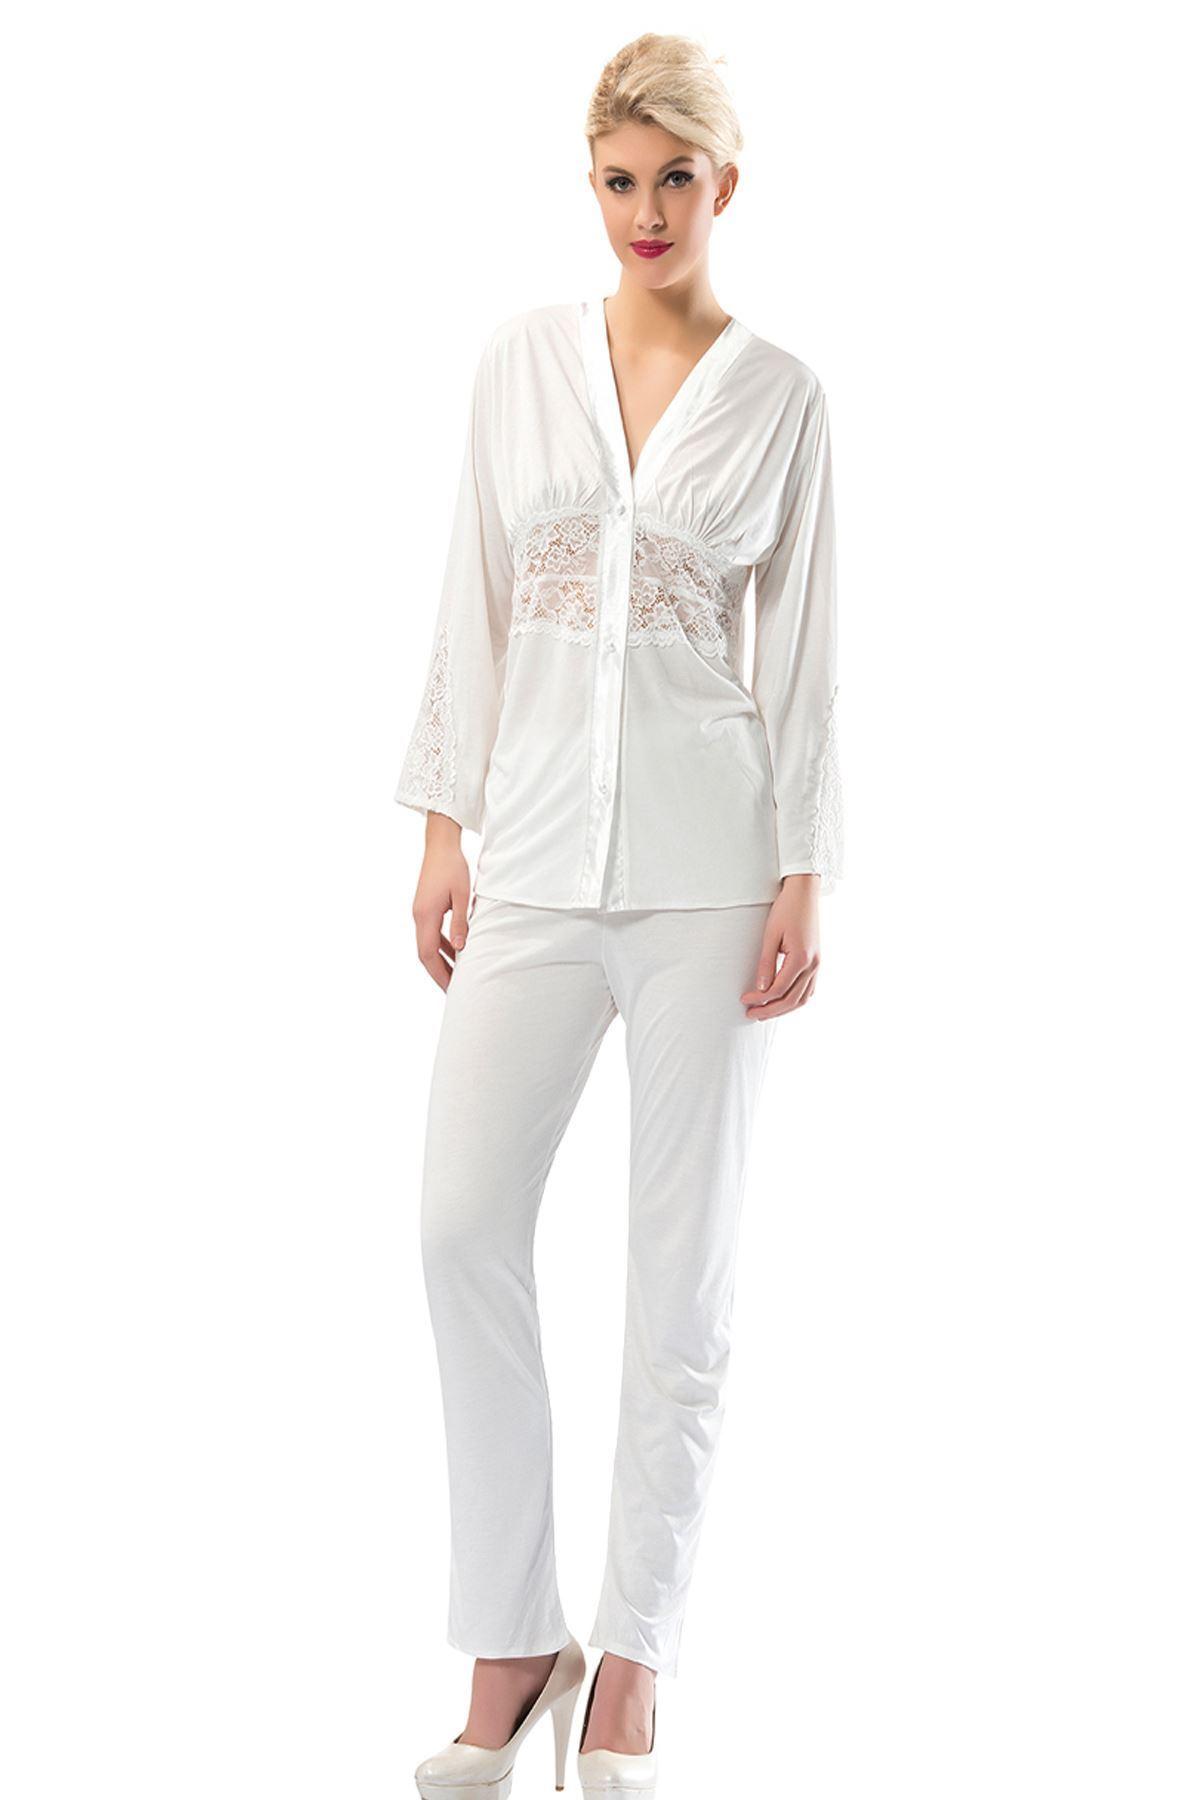 Sistina 1588 Penye Çeyizlik Pijama Takım